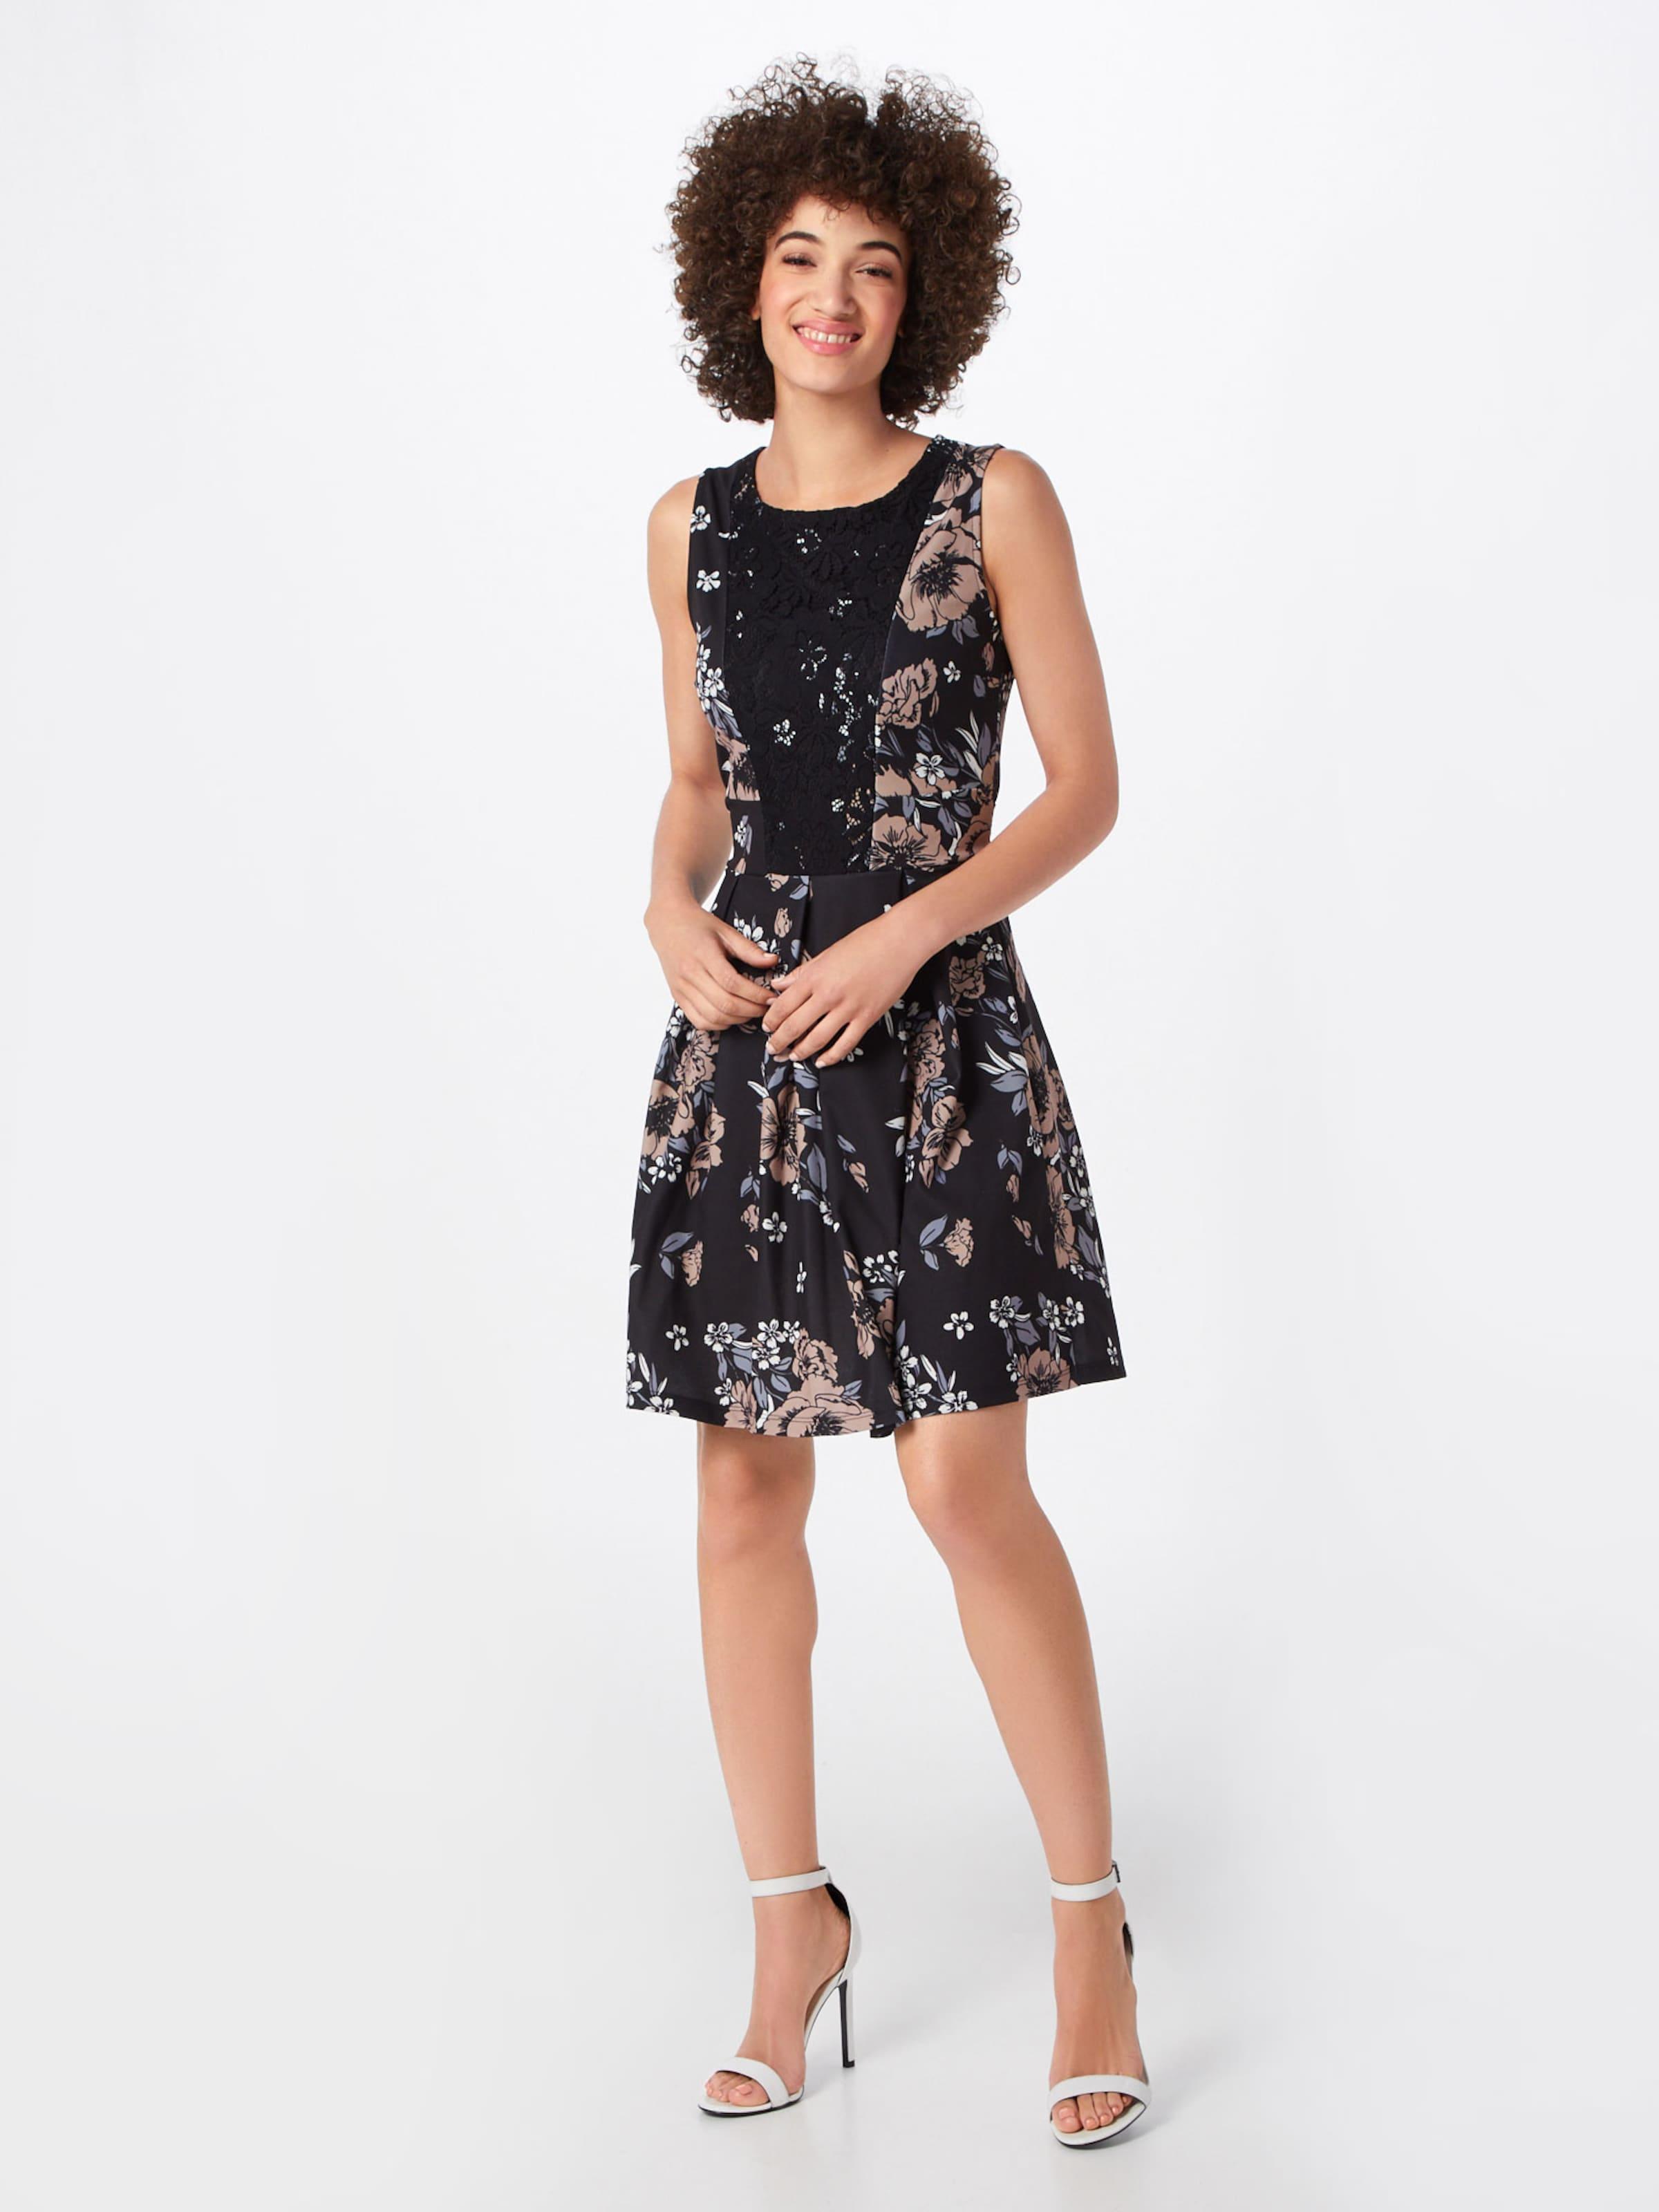 En RoseNoir About Blanc You Robe 'shania Dress' fb6g7yvY